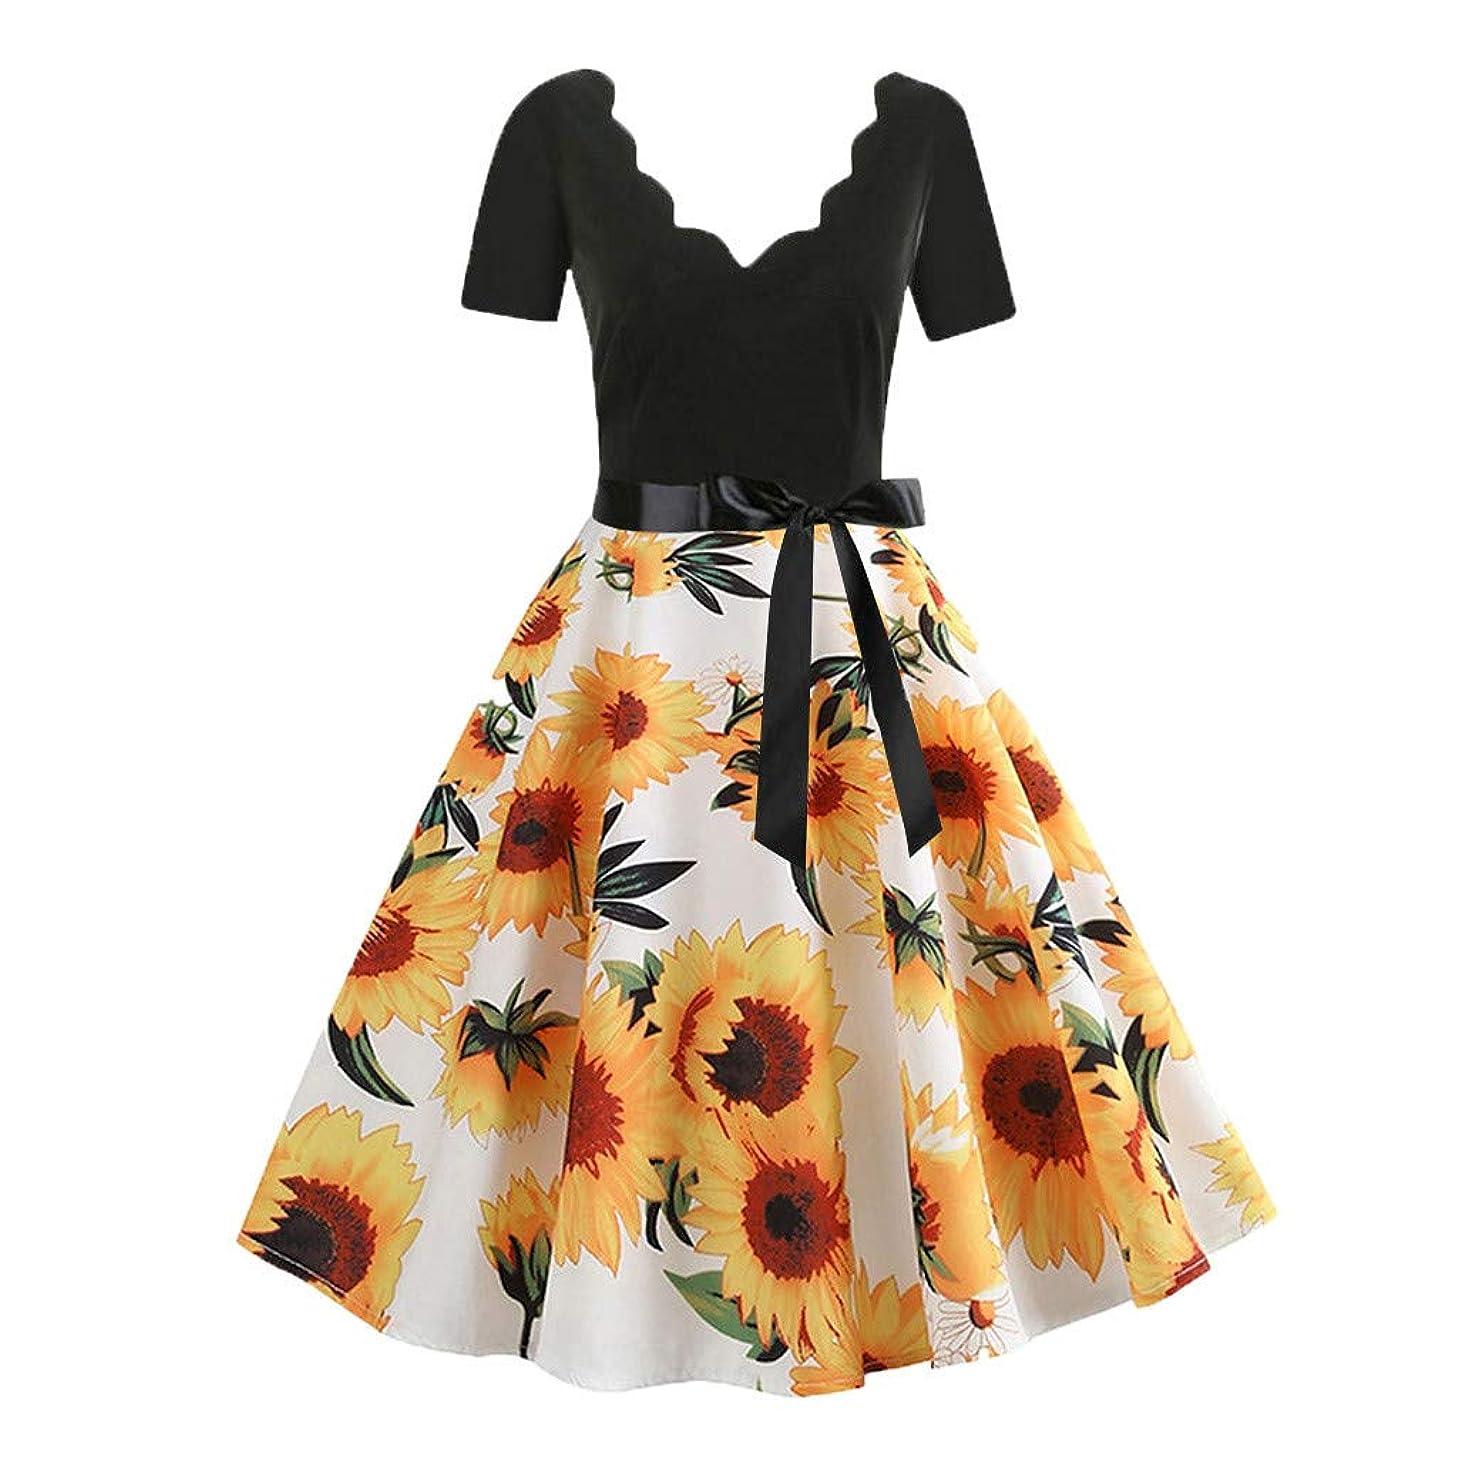 RoDeke Women's Summer Sunflower Floral Print V-Neck Backless Polka Dot Dress Short Sleeve Midi Party Dresses with Bow